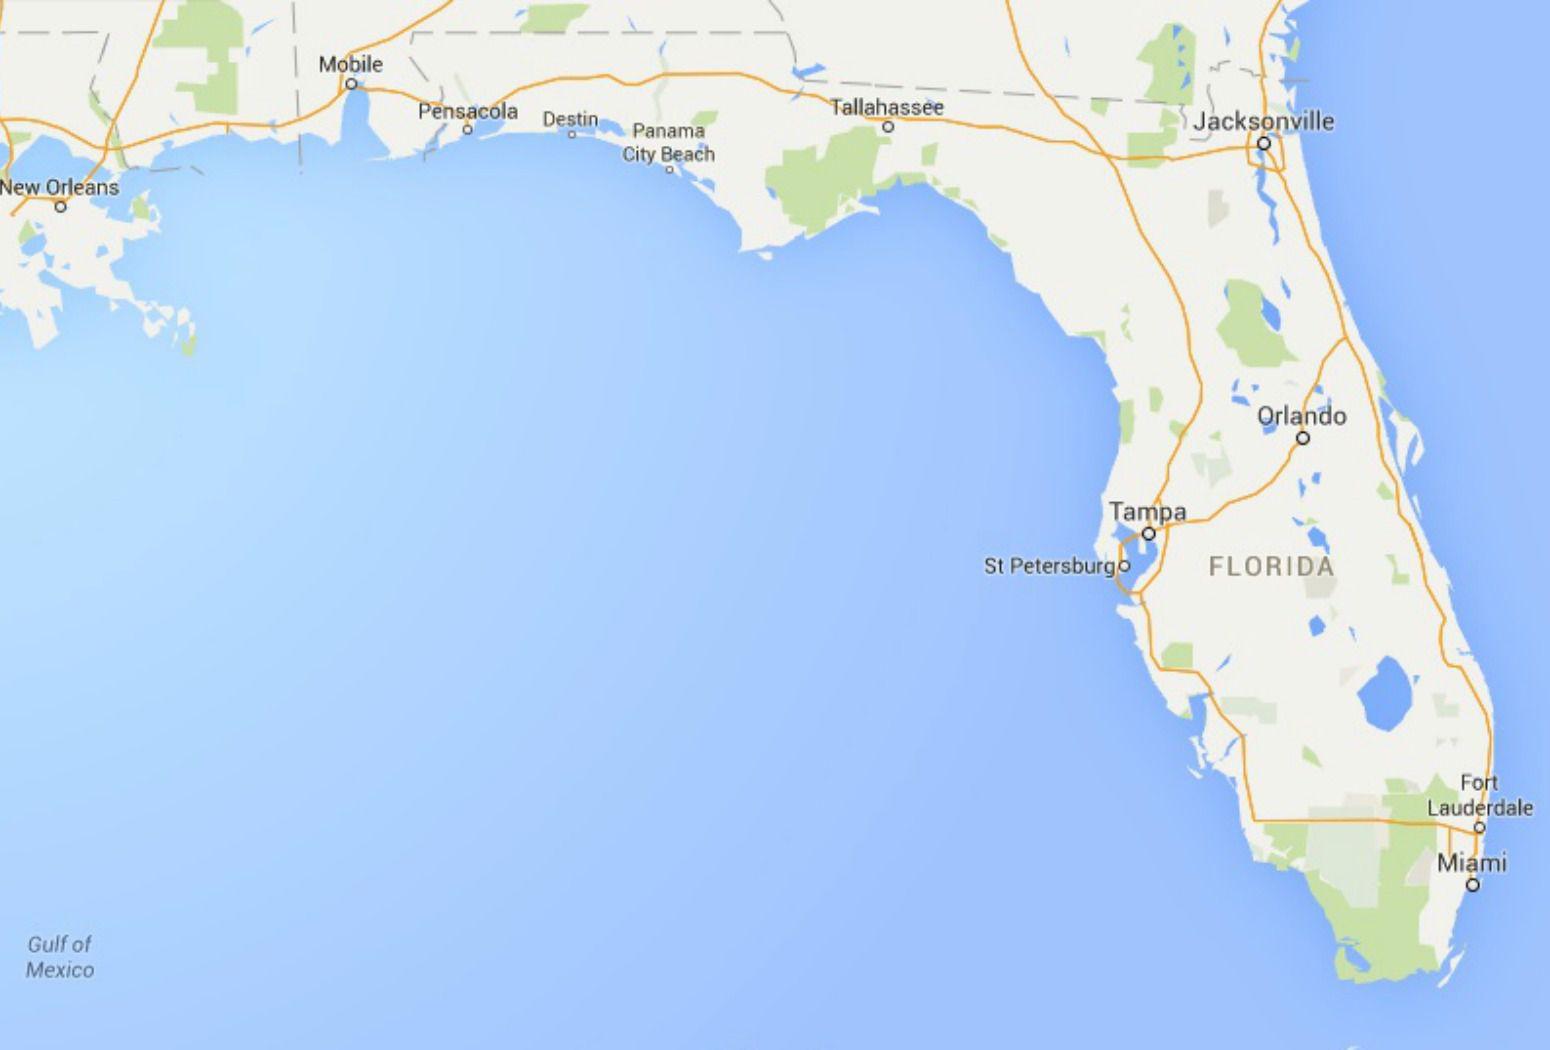 maps of florida: orlando, tampa, miami, keys, and more